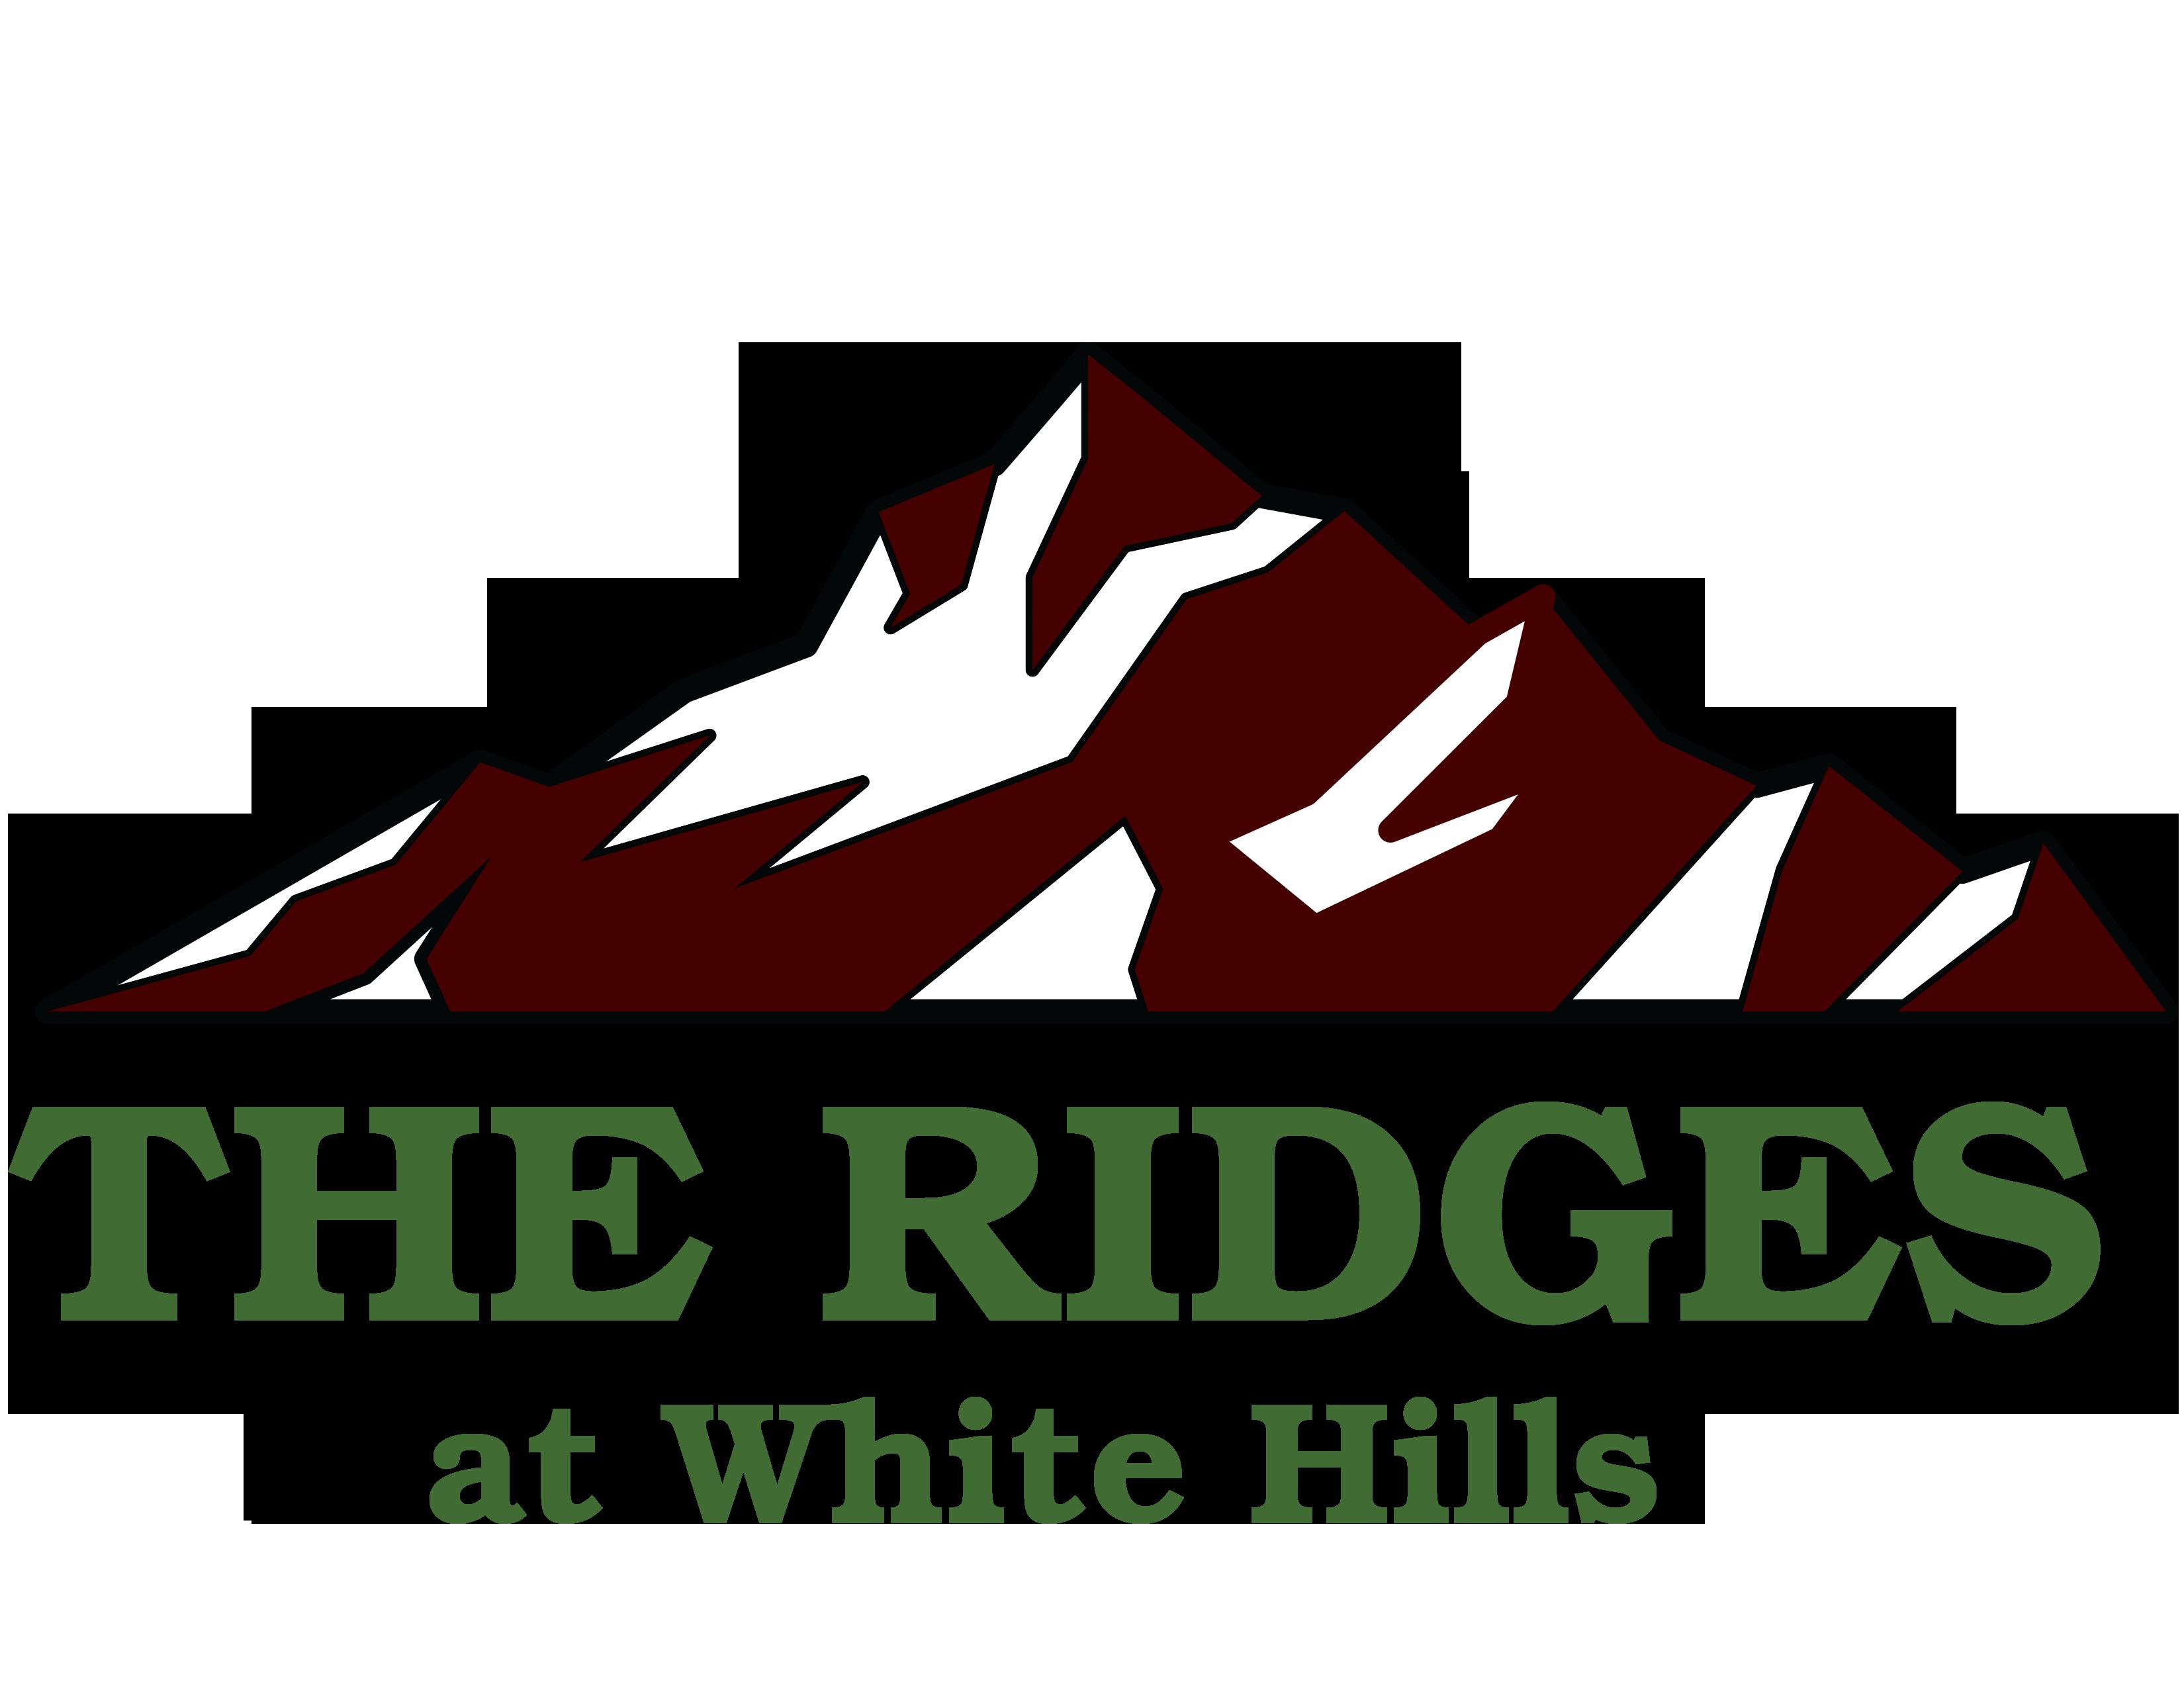 ridges_at_white_hills_II (1)